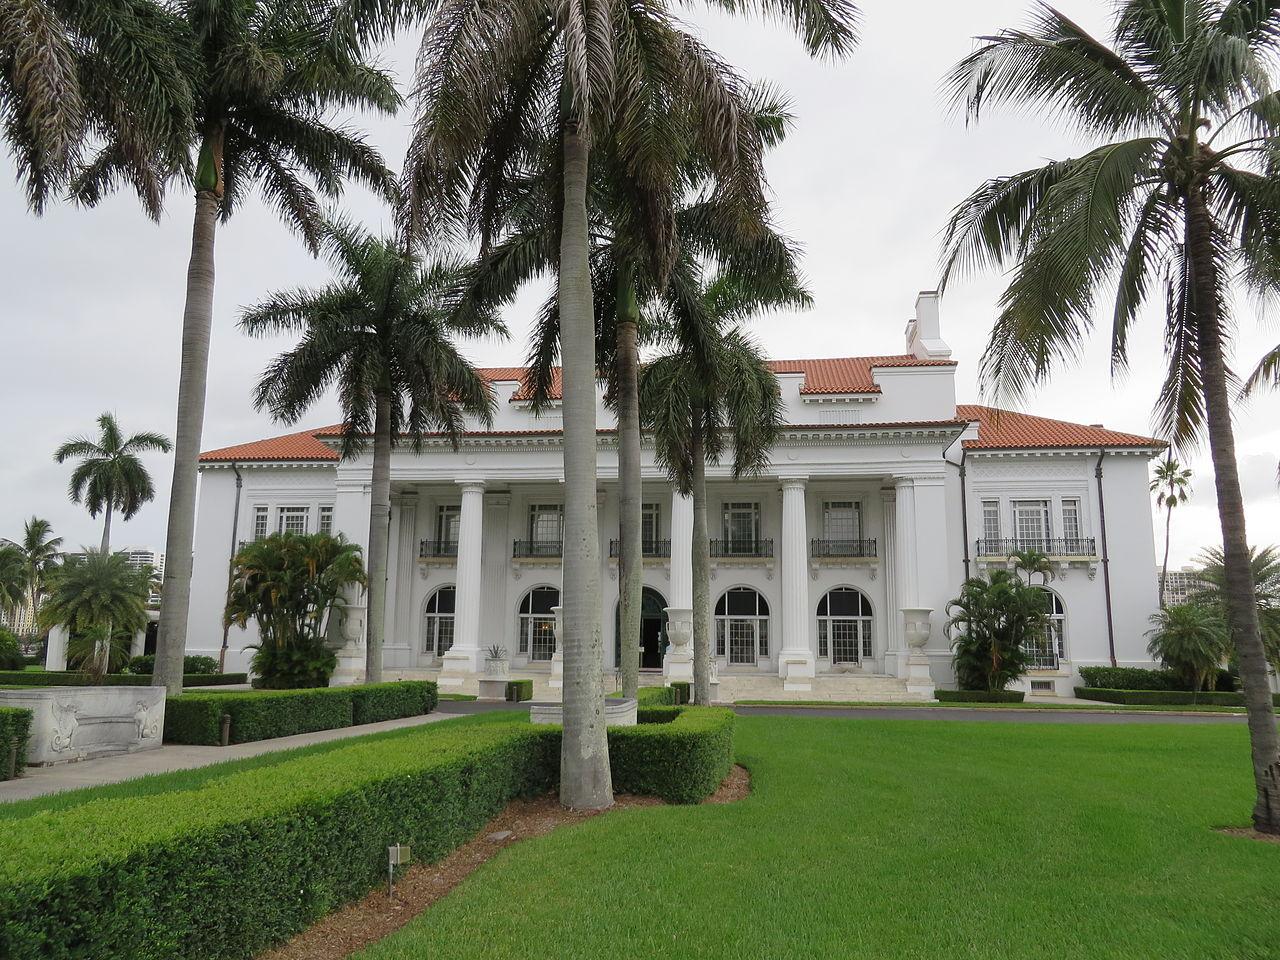 1Whitehall_(Palm_Beach,_Florida)_001.jpg